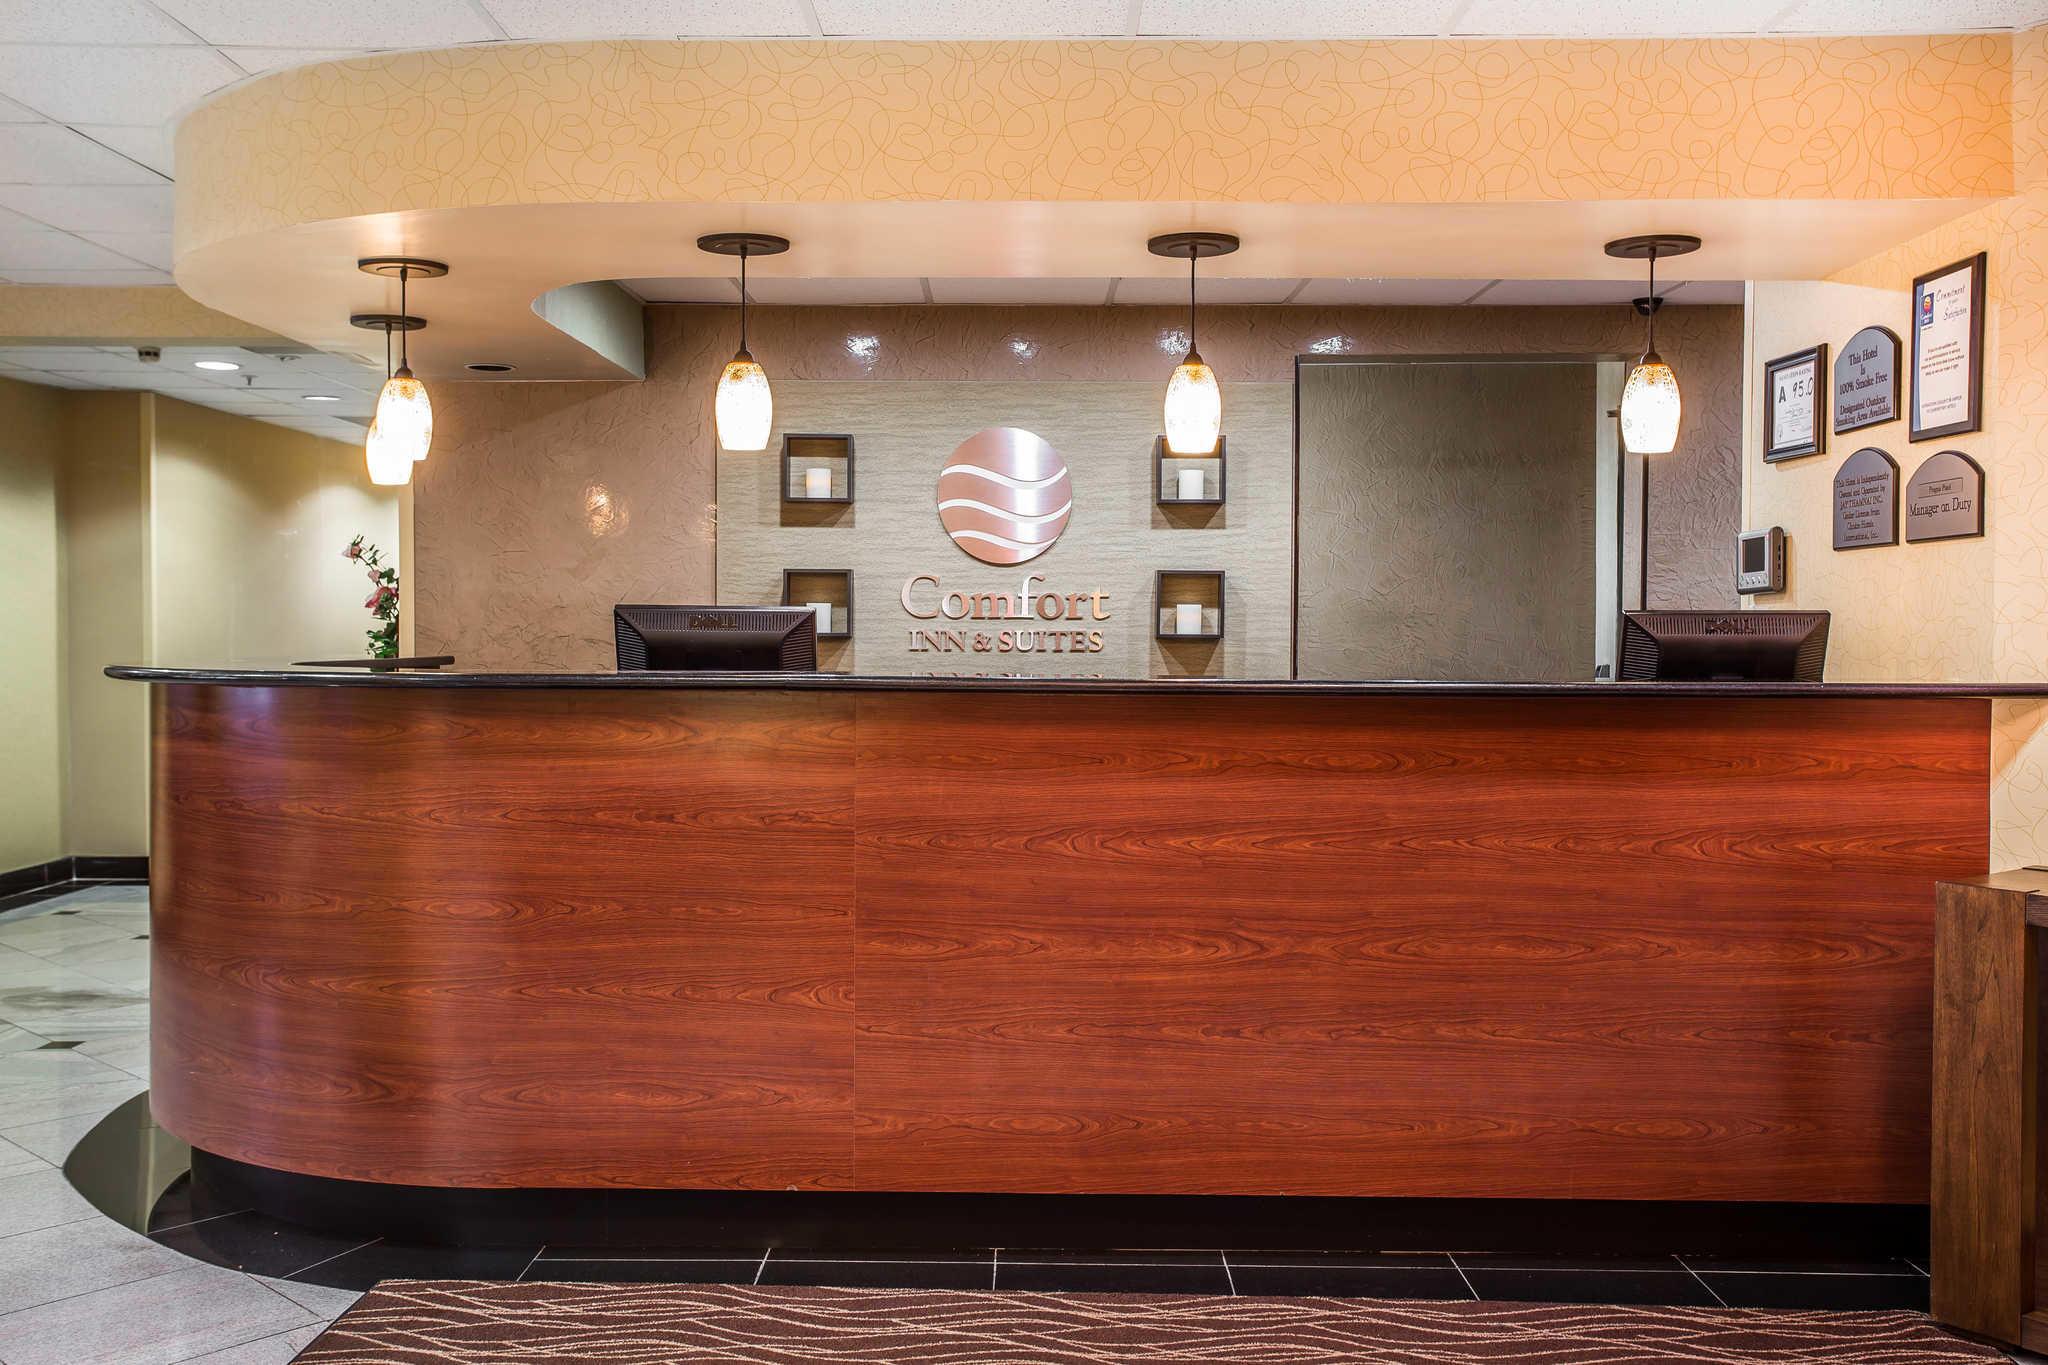 Comfort Inn & Suites Lake Norman image 2